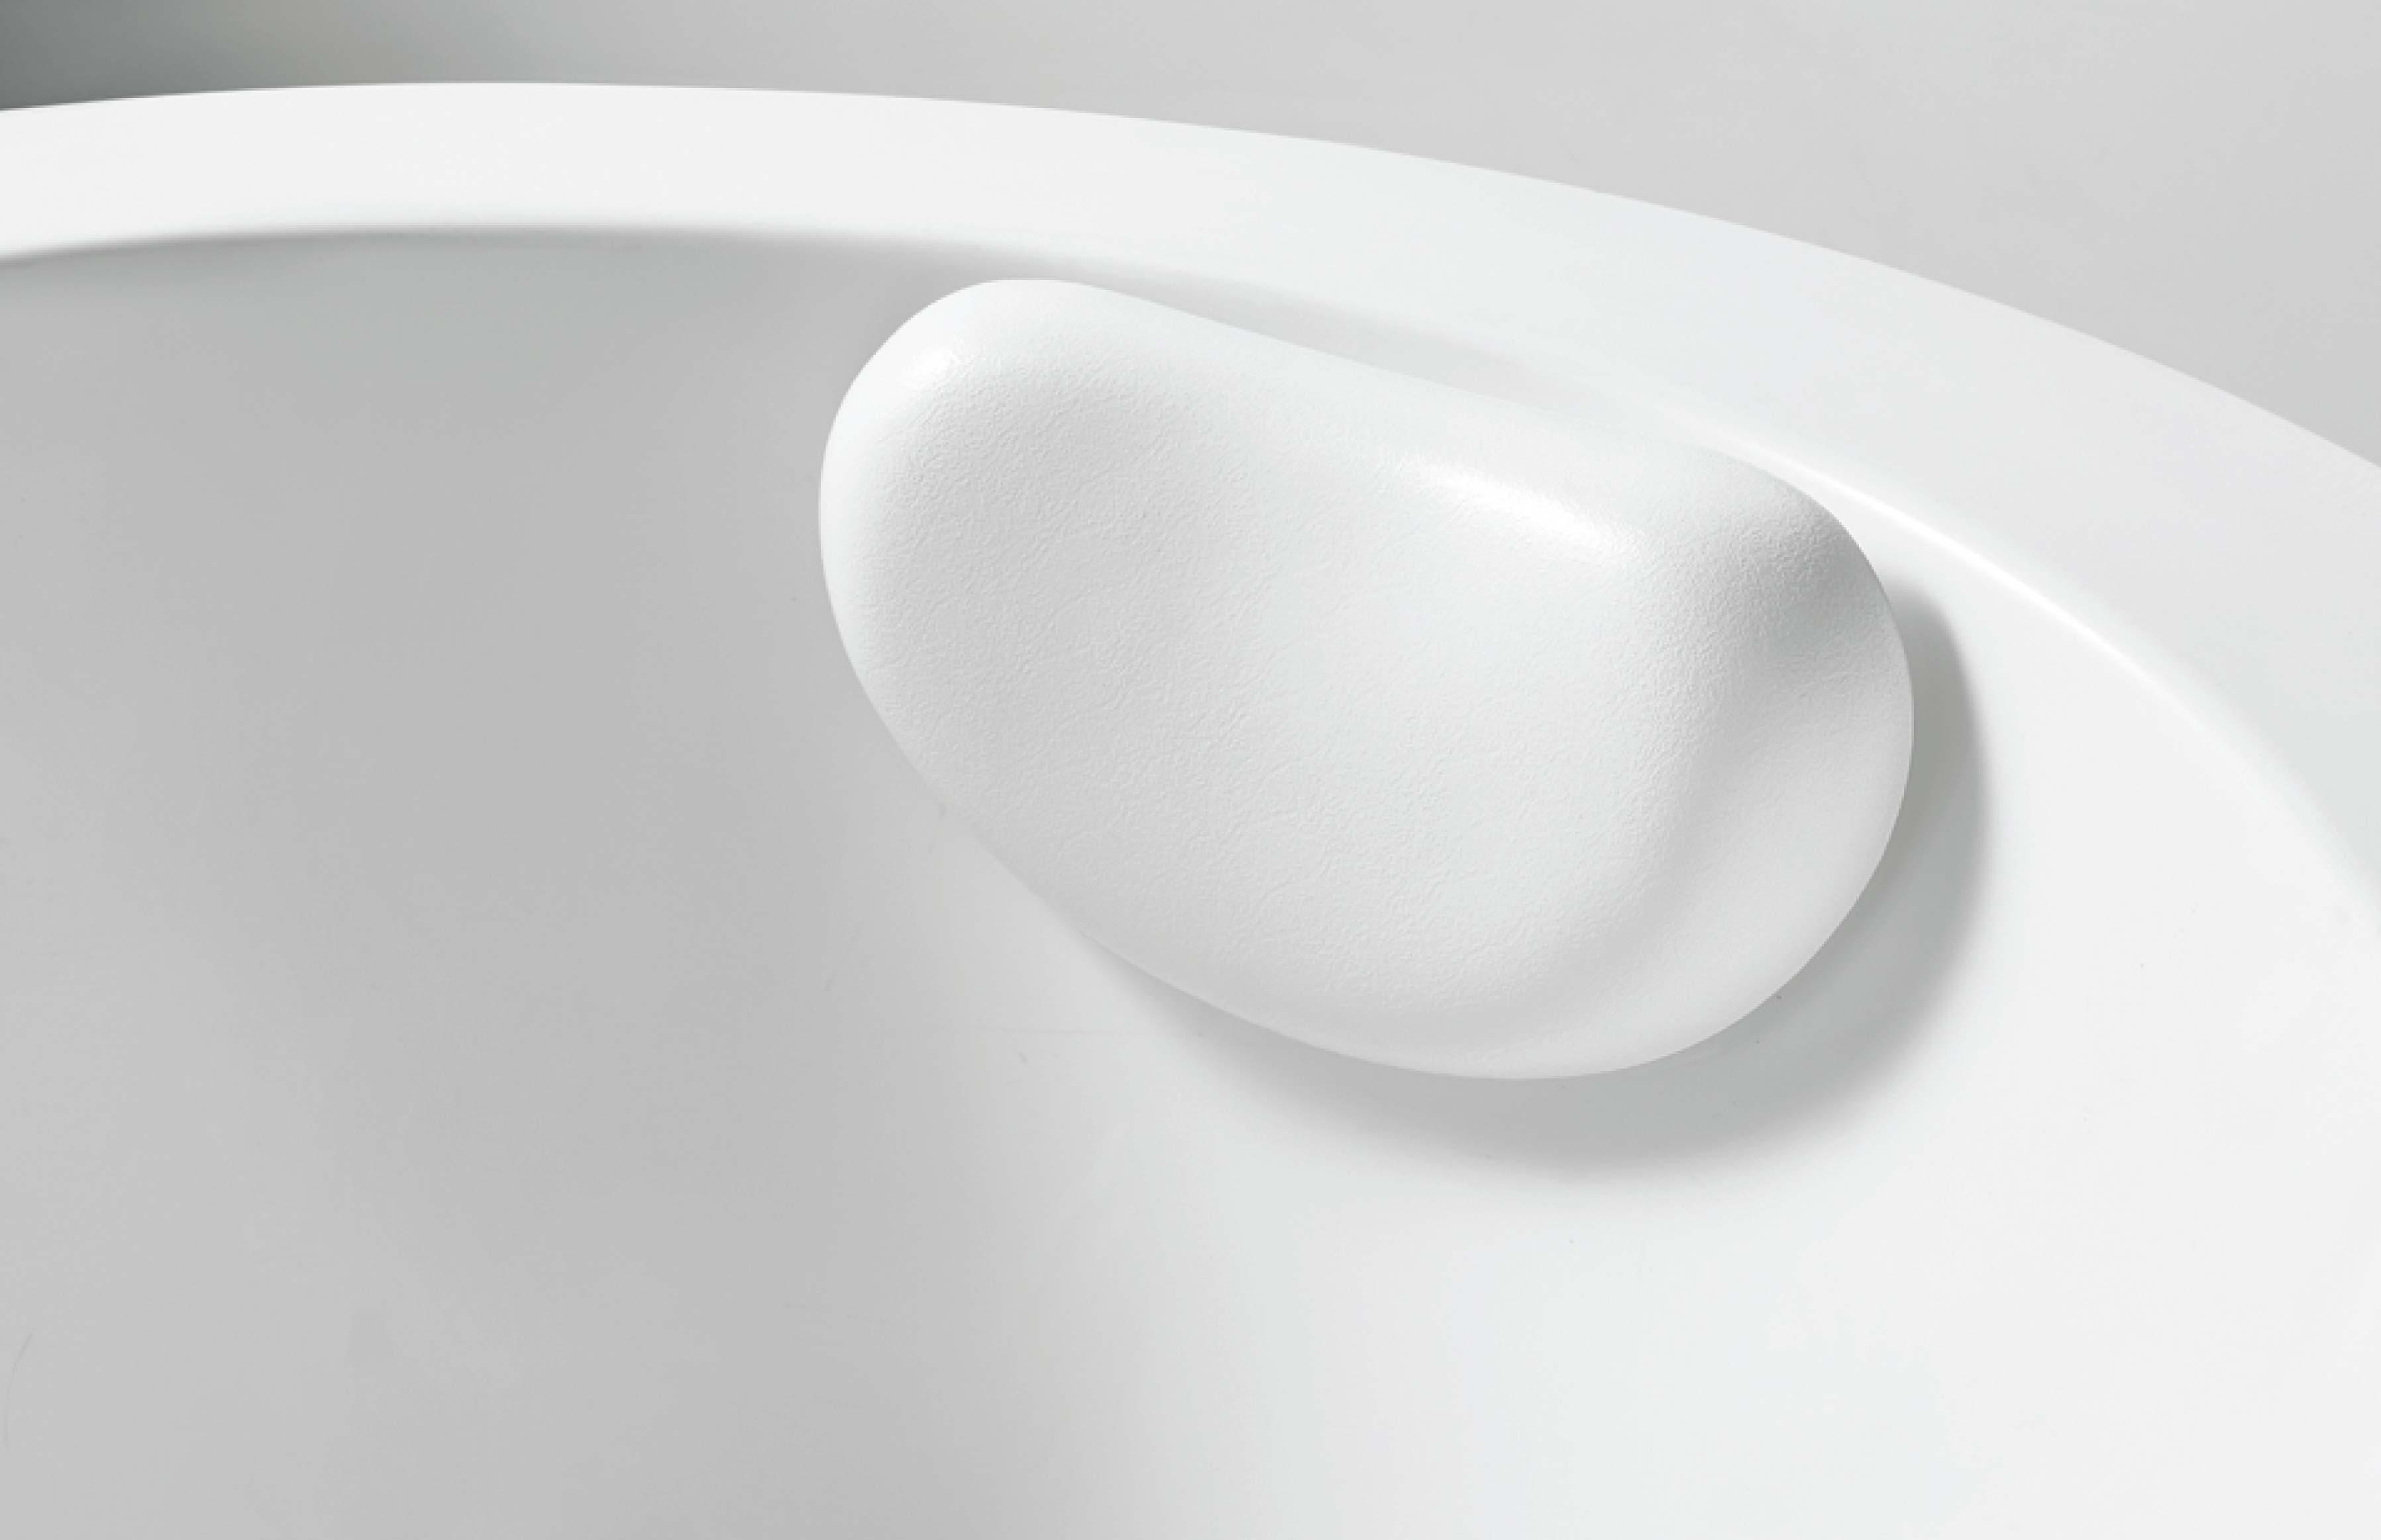 J89401-01_pillow